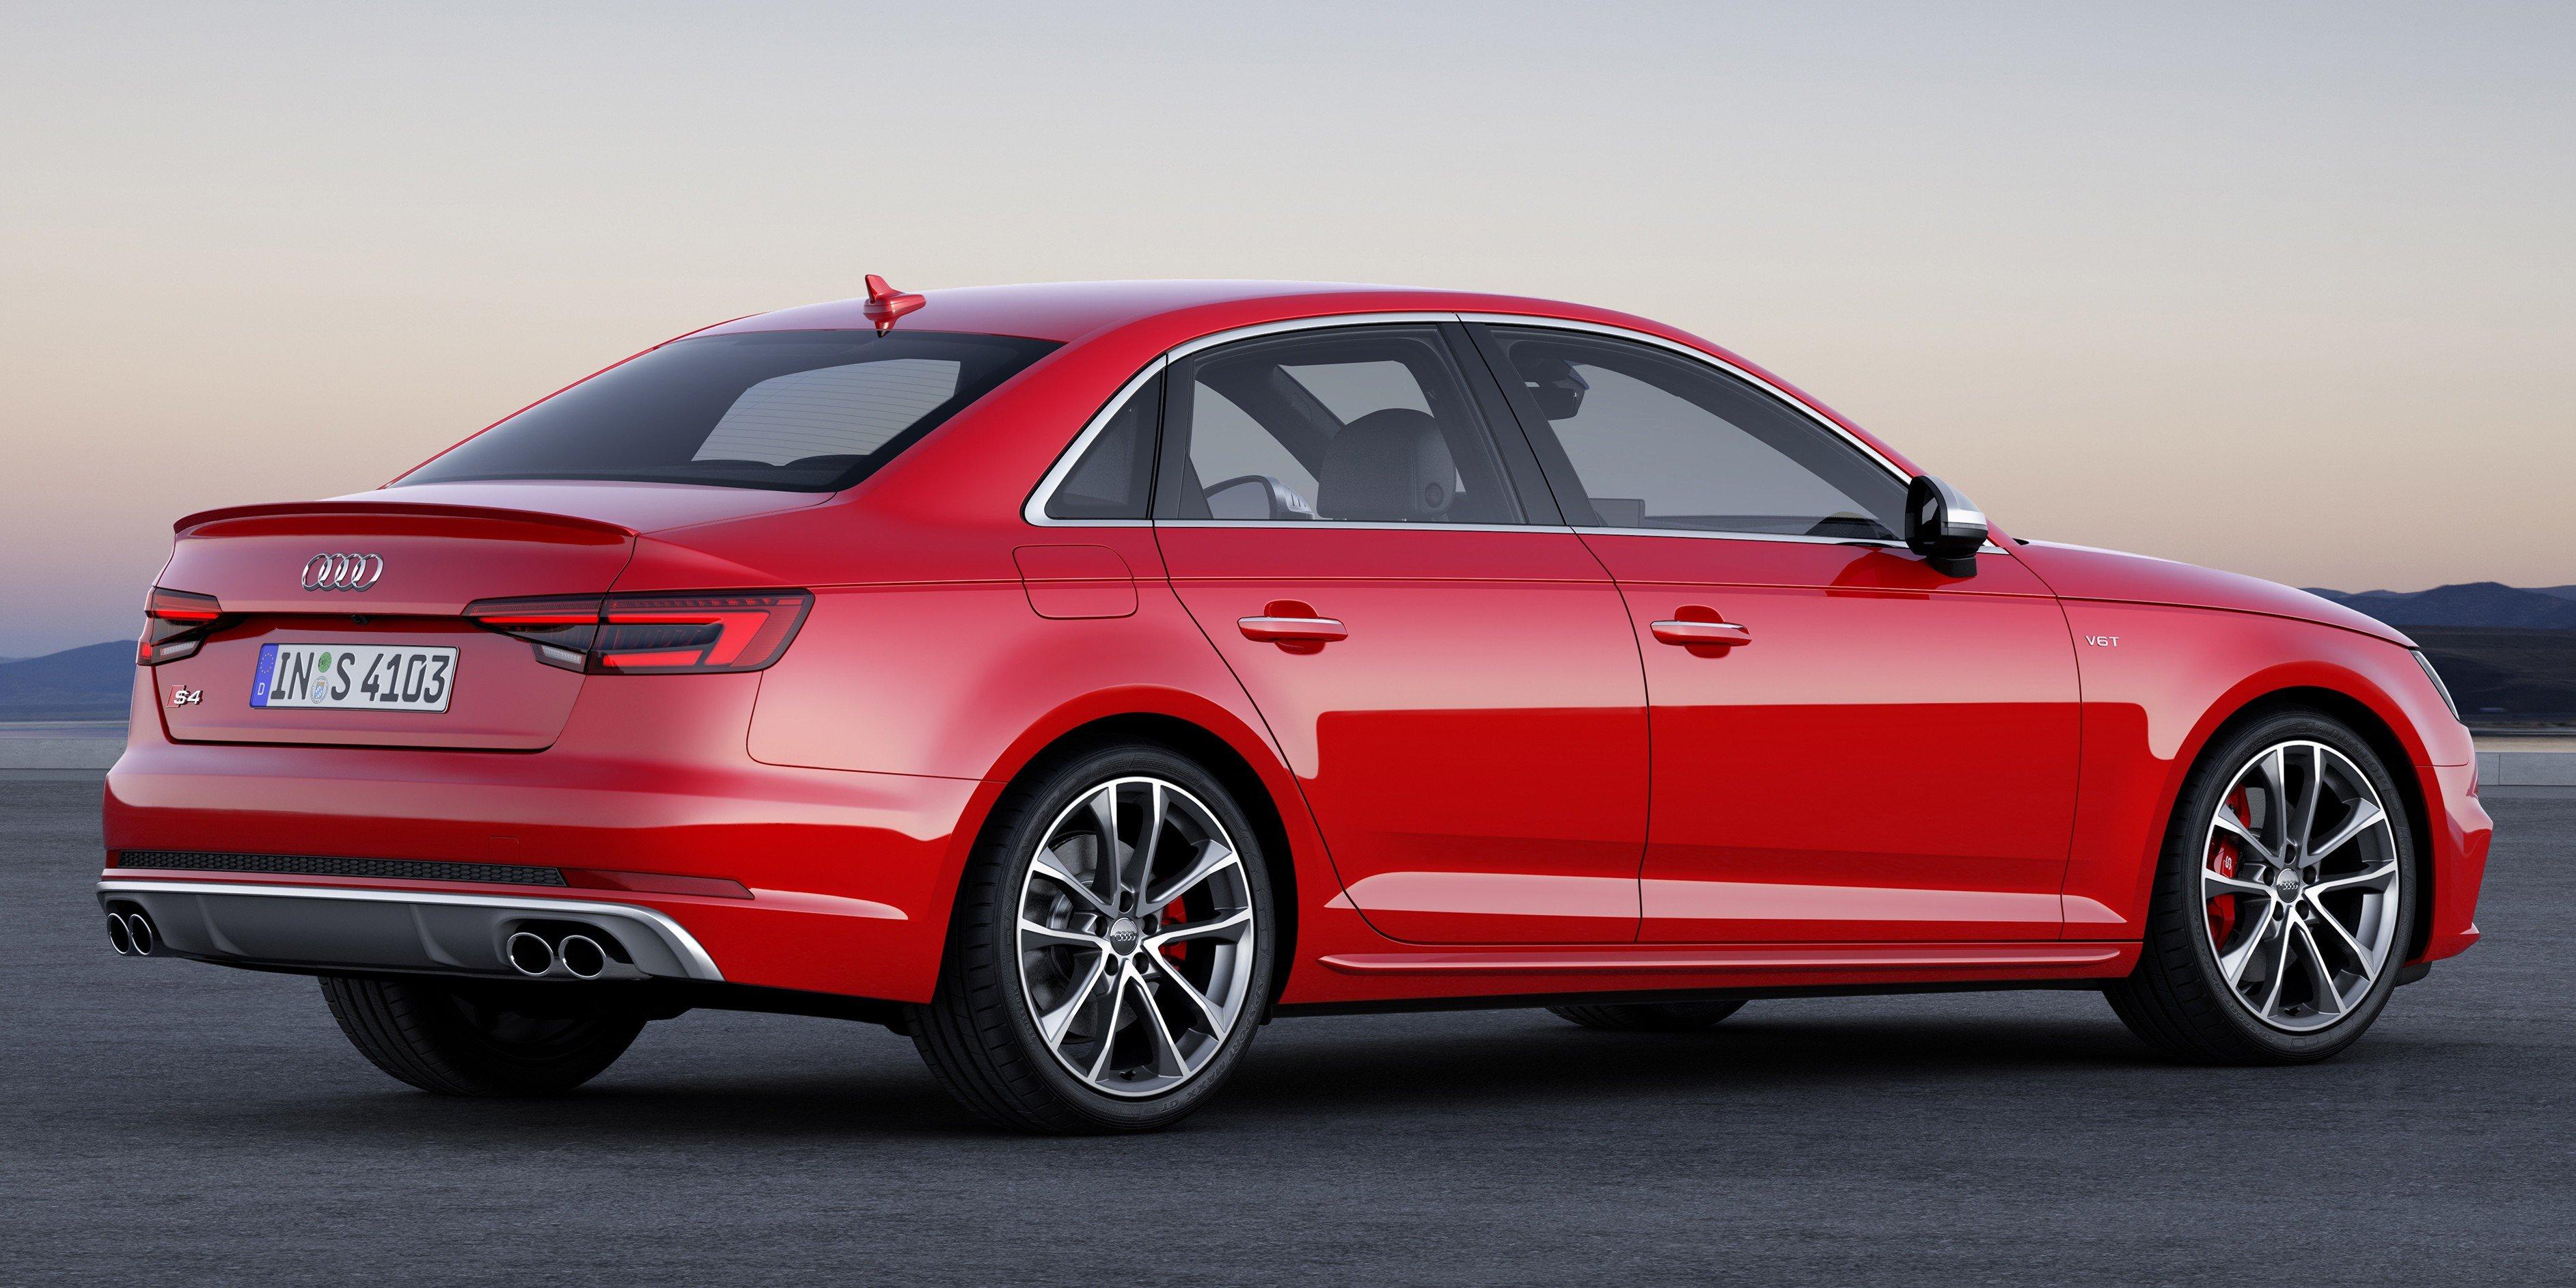 Frankfurt 2015: B9 Audi S4 revealed packing 354 PS Image ...